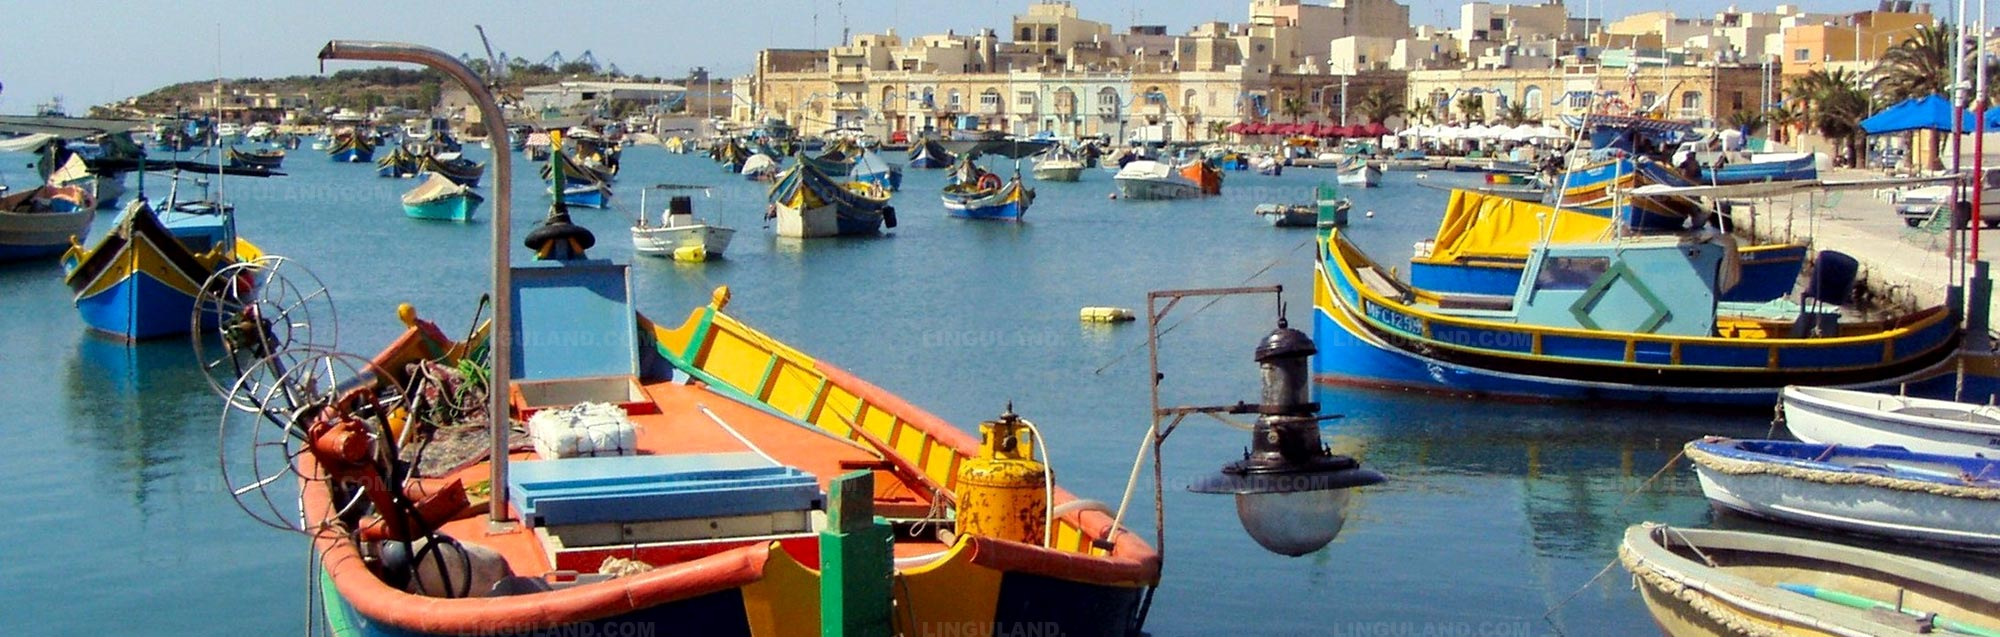 Cours de préparation examen de TOEFL: Malte